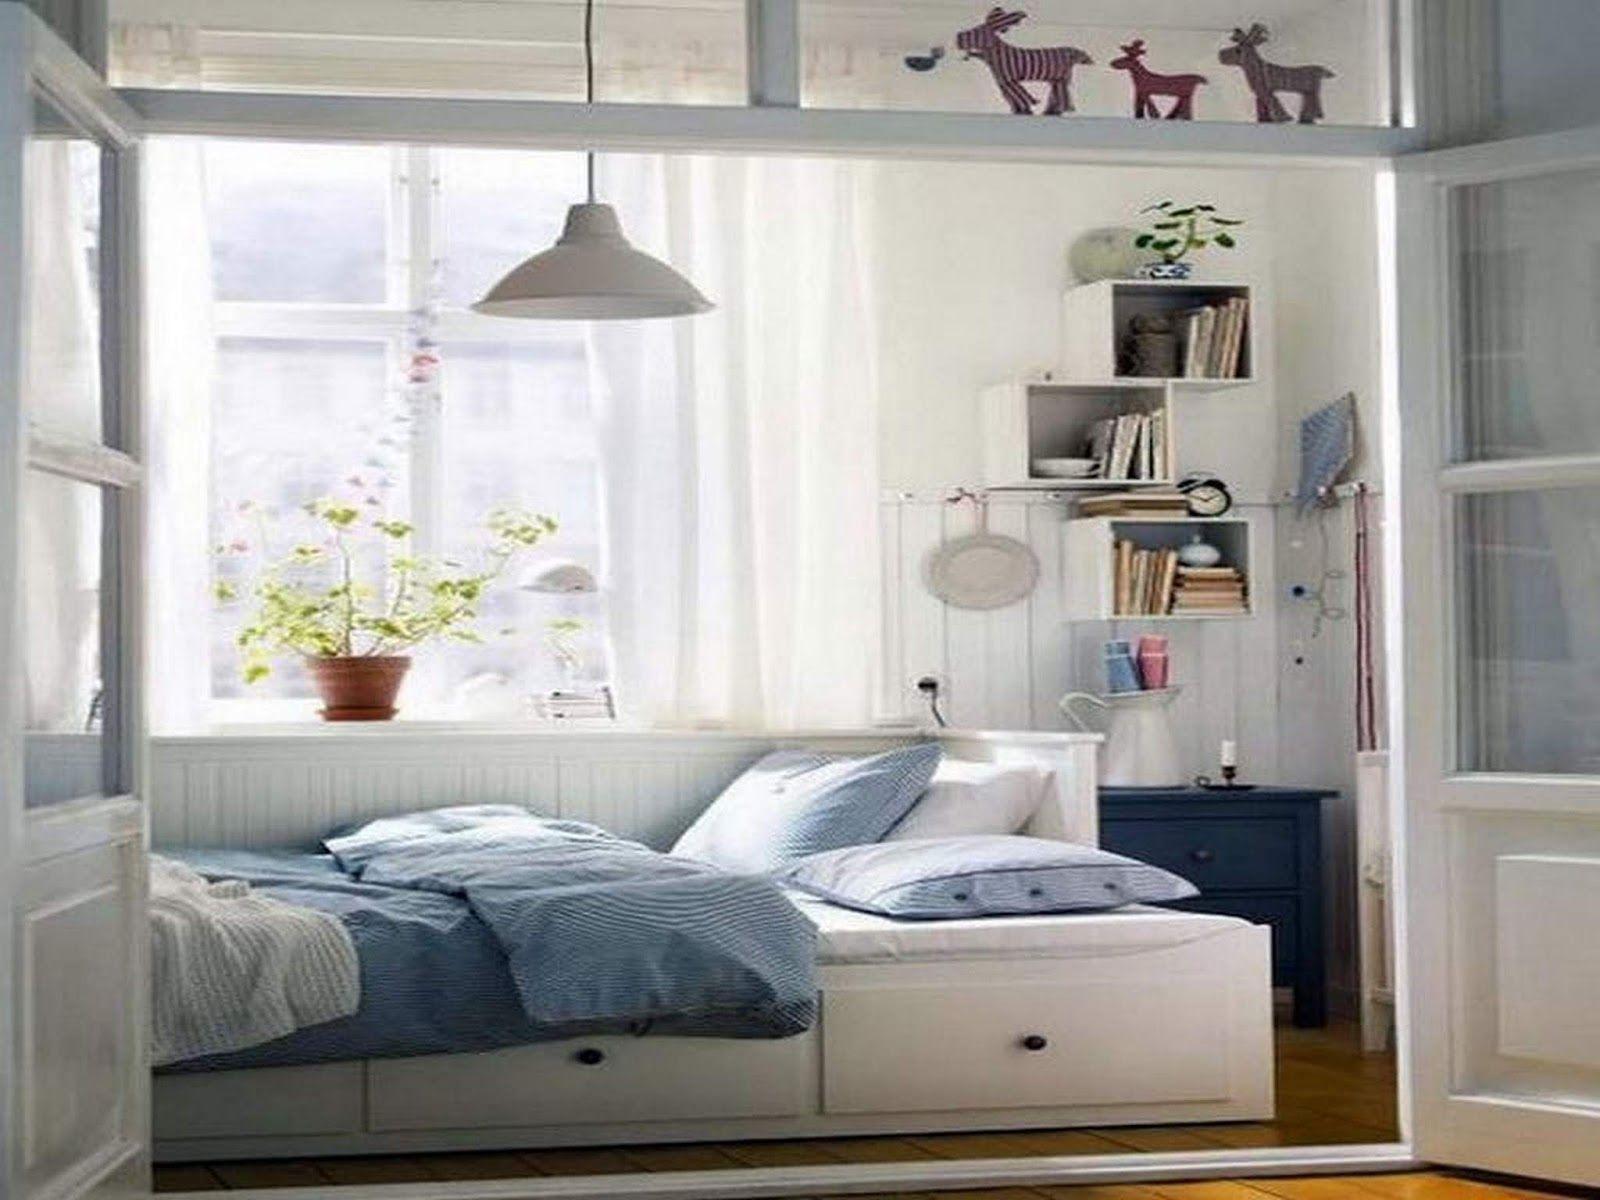 Hugedomains Com Cheap Room Decor Ikea Small Bedroom Small Room Bedroom